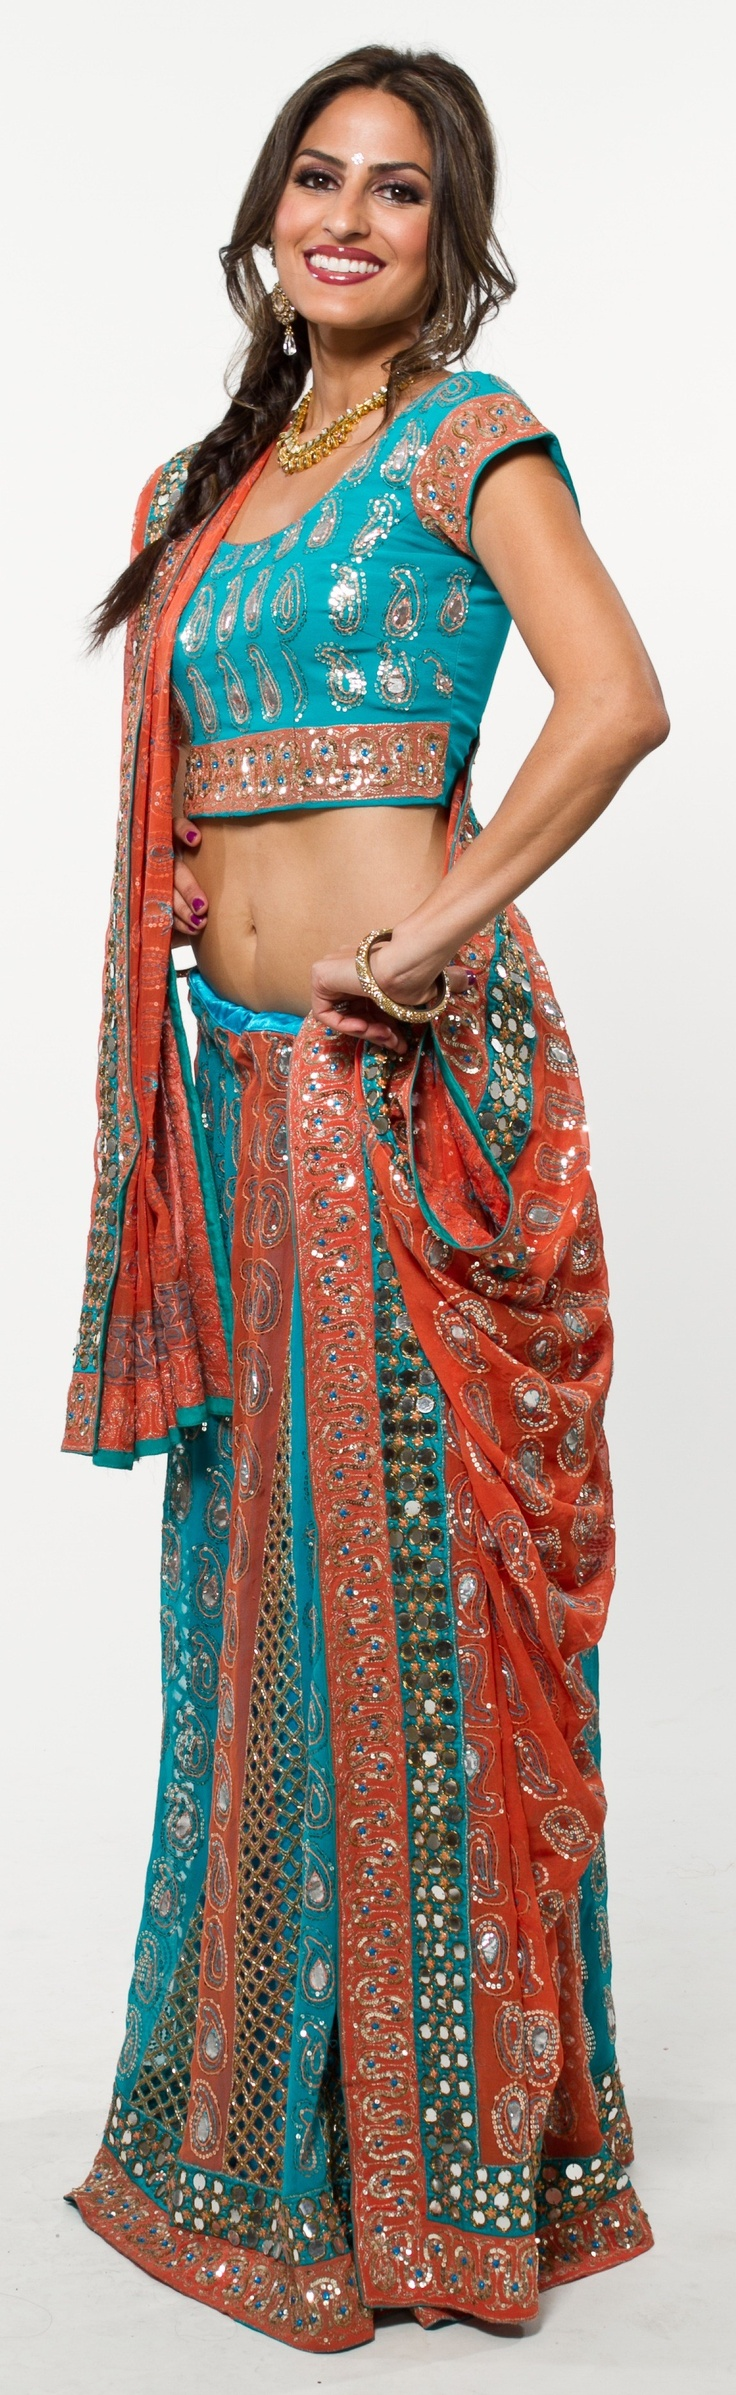 Blush Orange & Turquoise Chaniya Choli